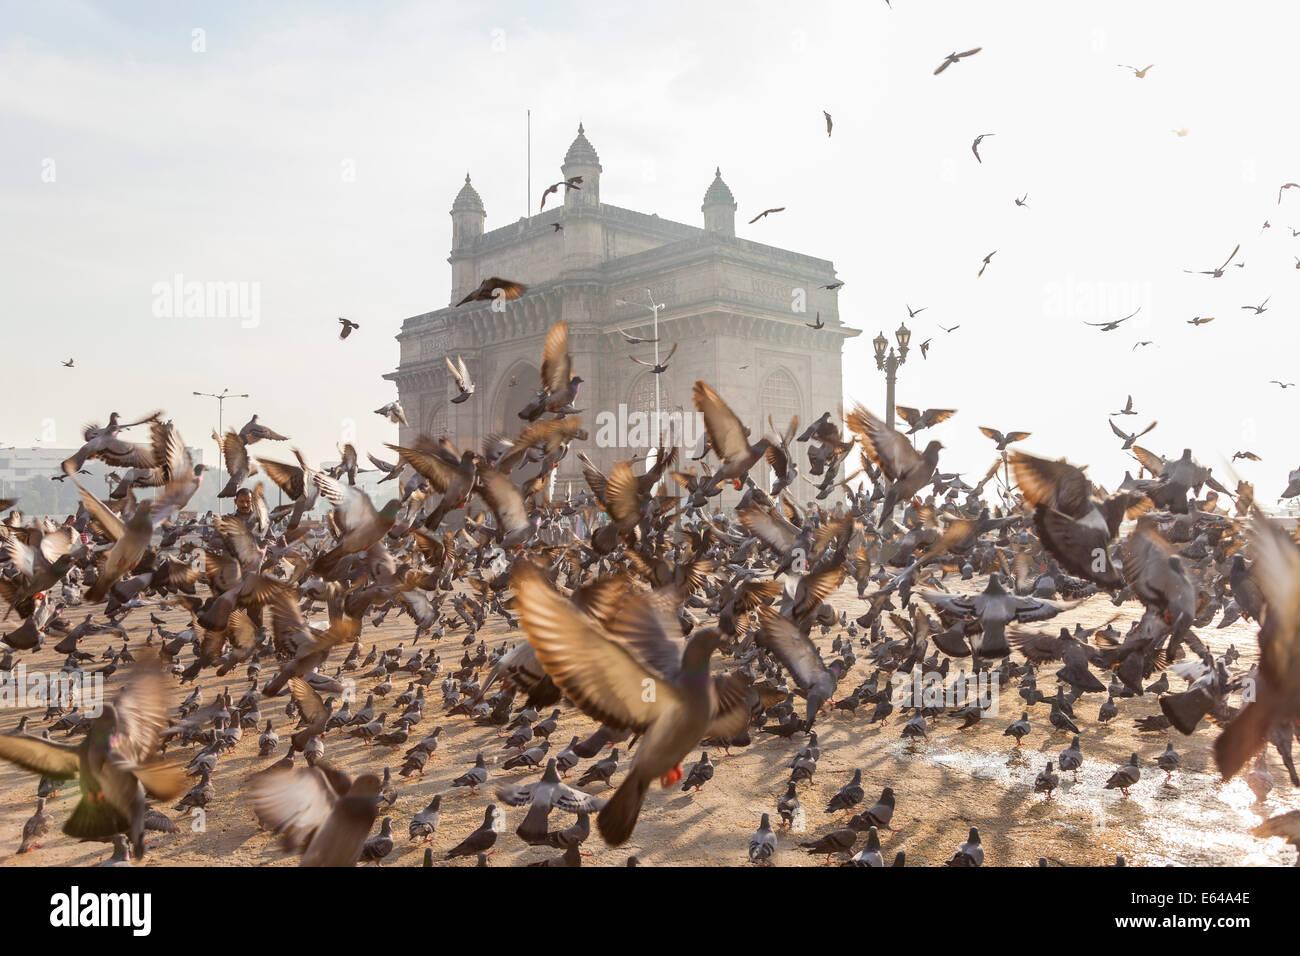 Les pigeons, porte de l'Inde, Colaba, Mumbai (Bombay), Inde Photo Stock